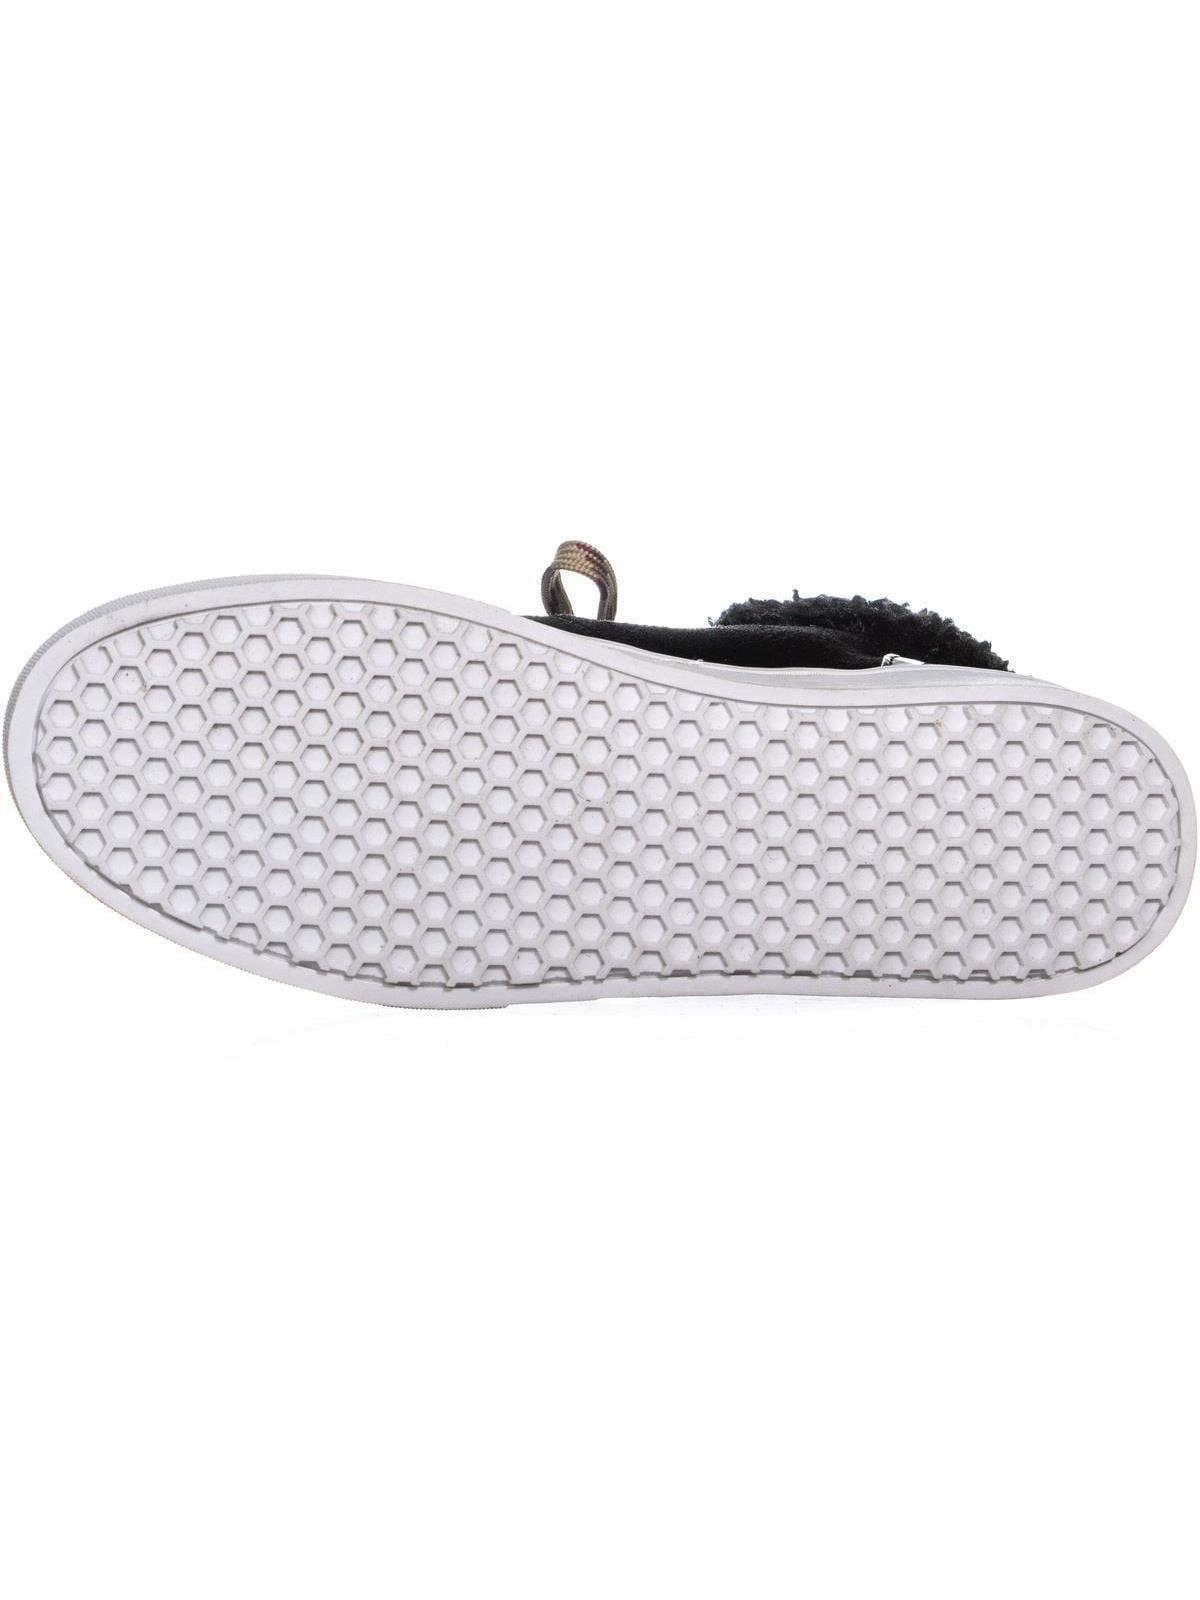 3f087acb9b84 Sam Edelman - Womens Sam Edelman Luther High-Top Fashion Sneakers ...